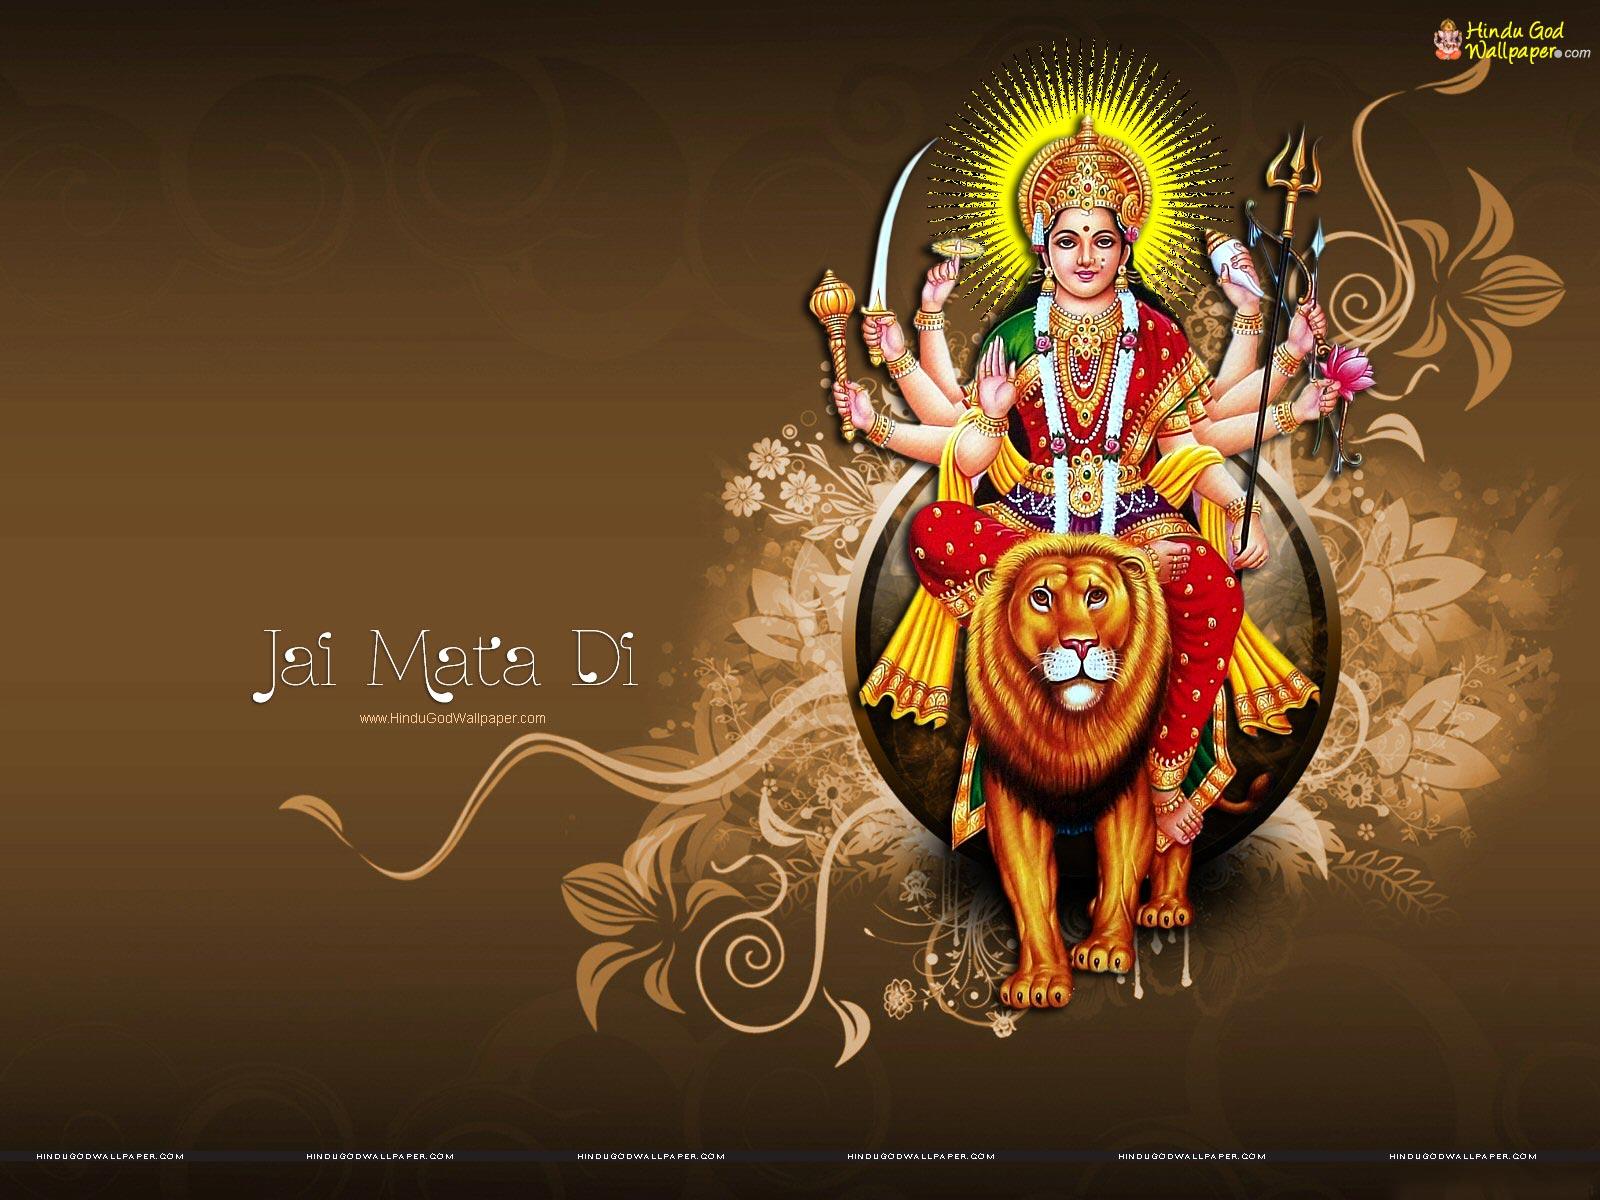 Jai Mata Di HD Wallpapers, Images and Photos Free Download